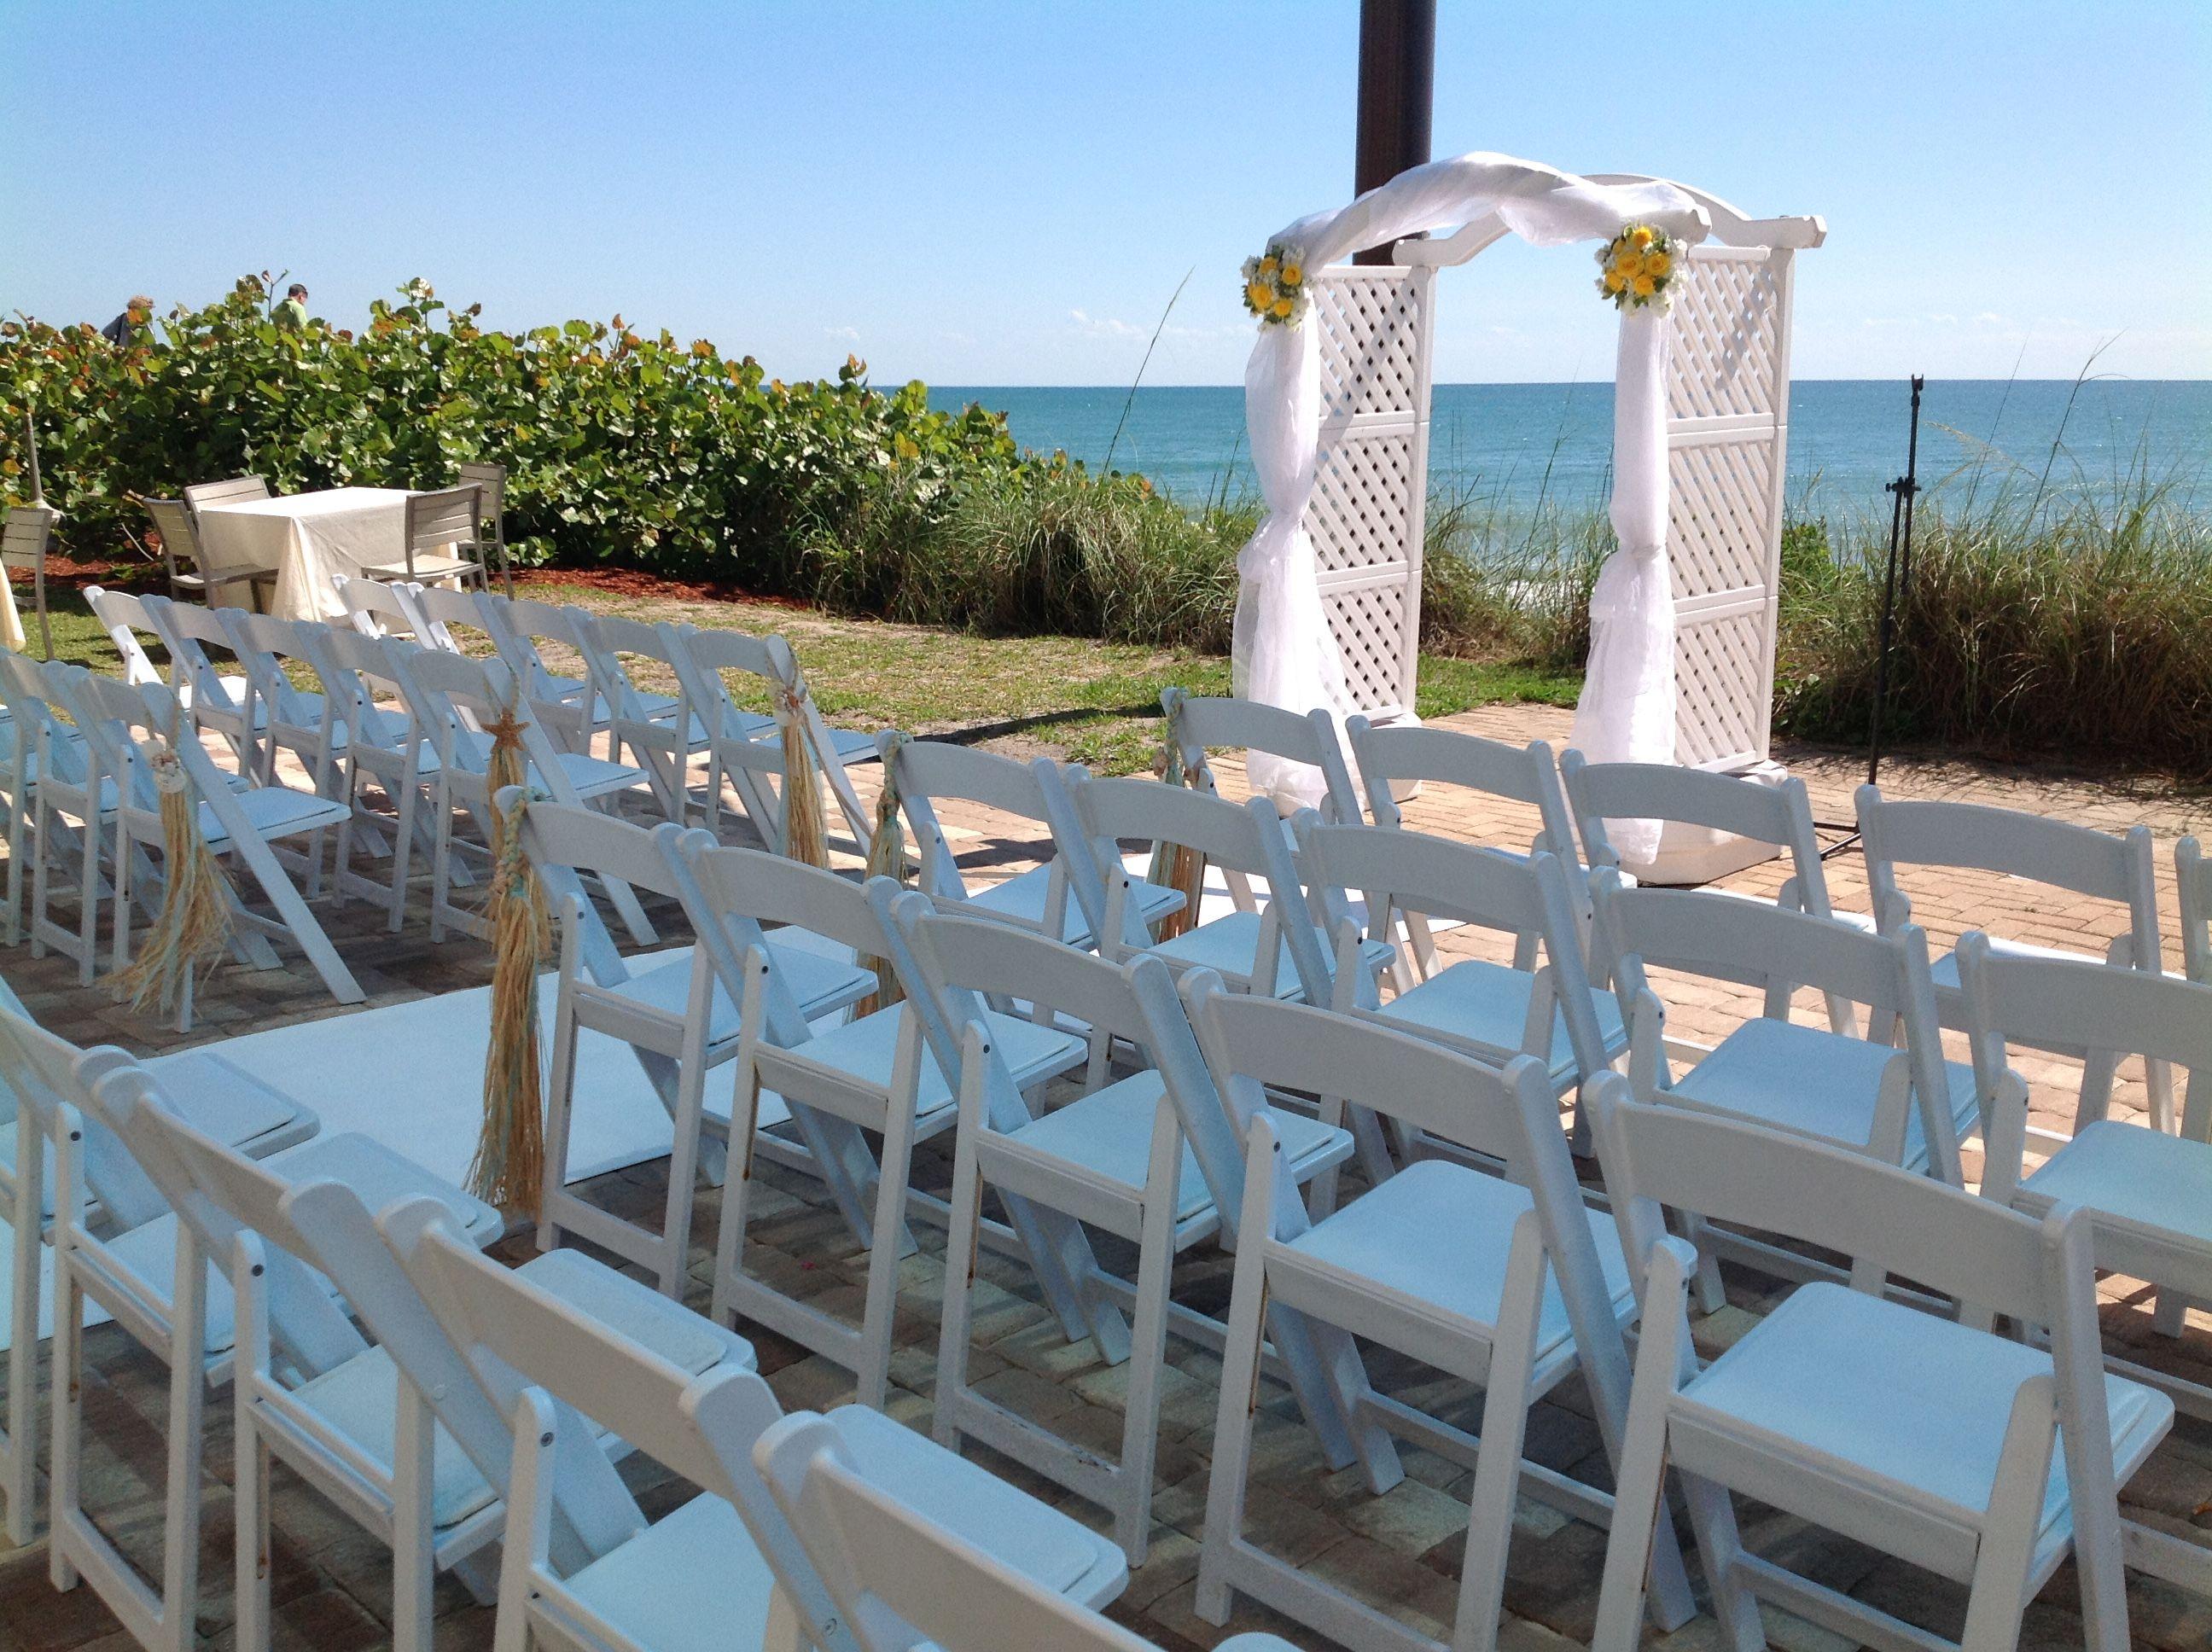 Top 10 wedding decorations november 2018 Pin by Hilton Melbourne Beach Oceanfront Weddings on Deck Weddings